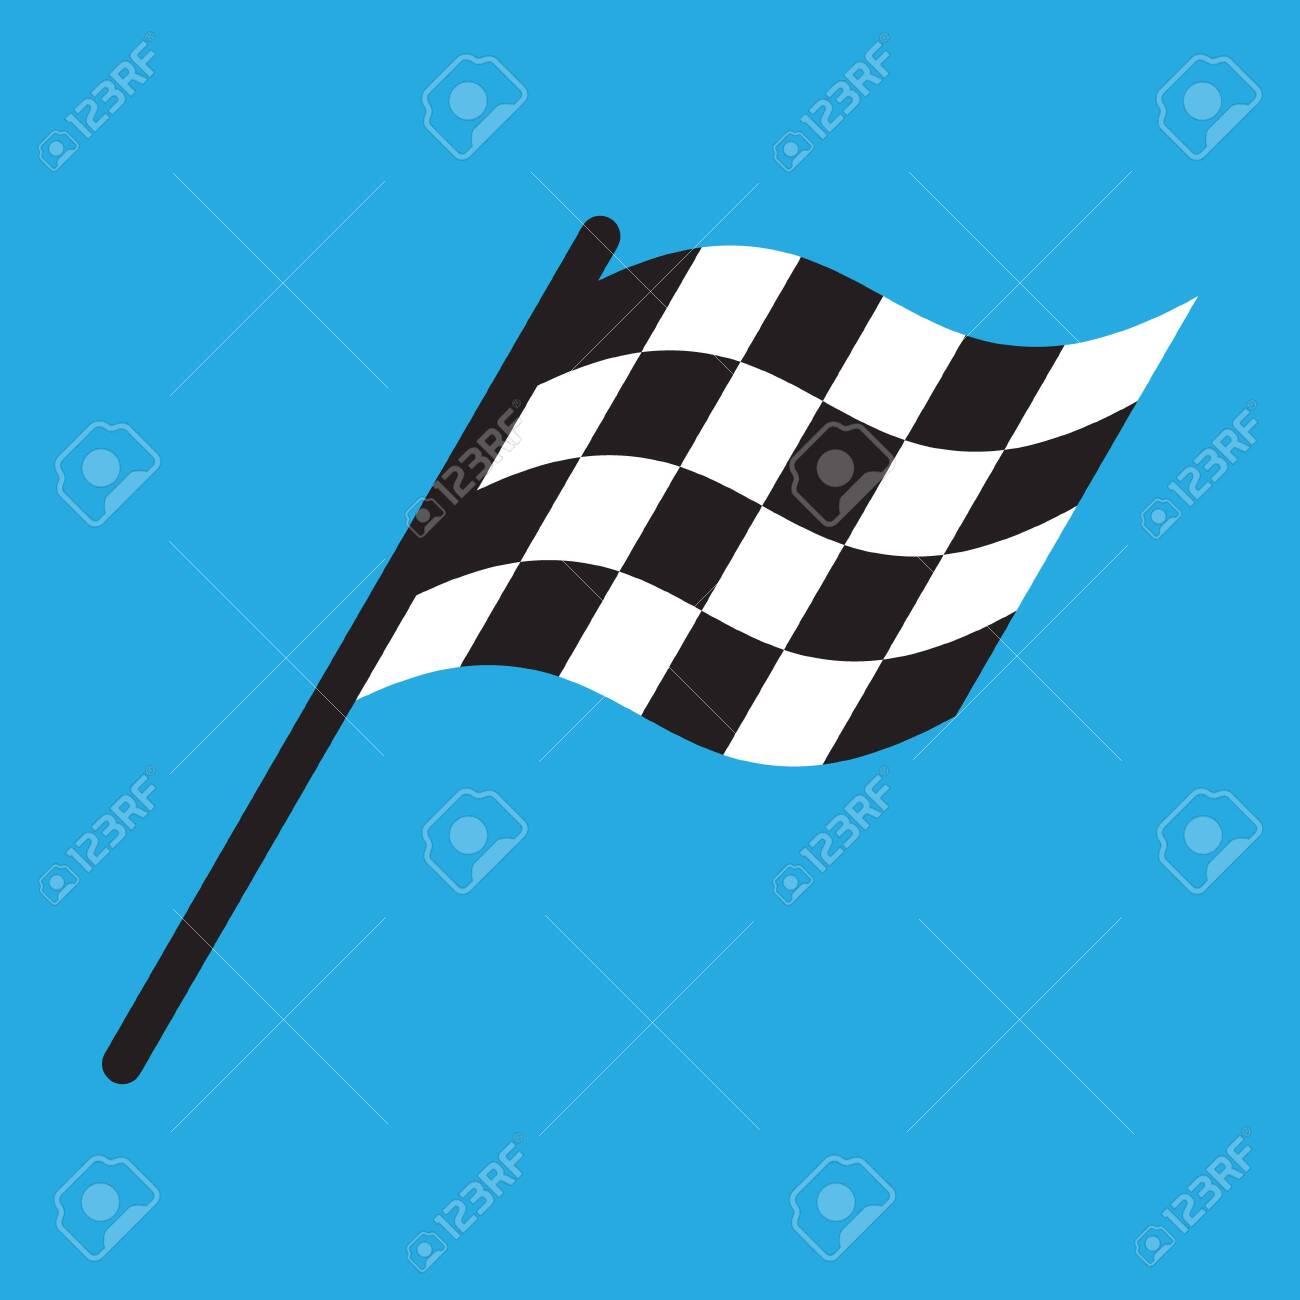 Race flag simple design illustration vector - 121501495